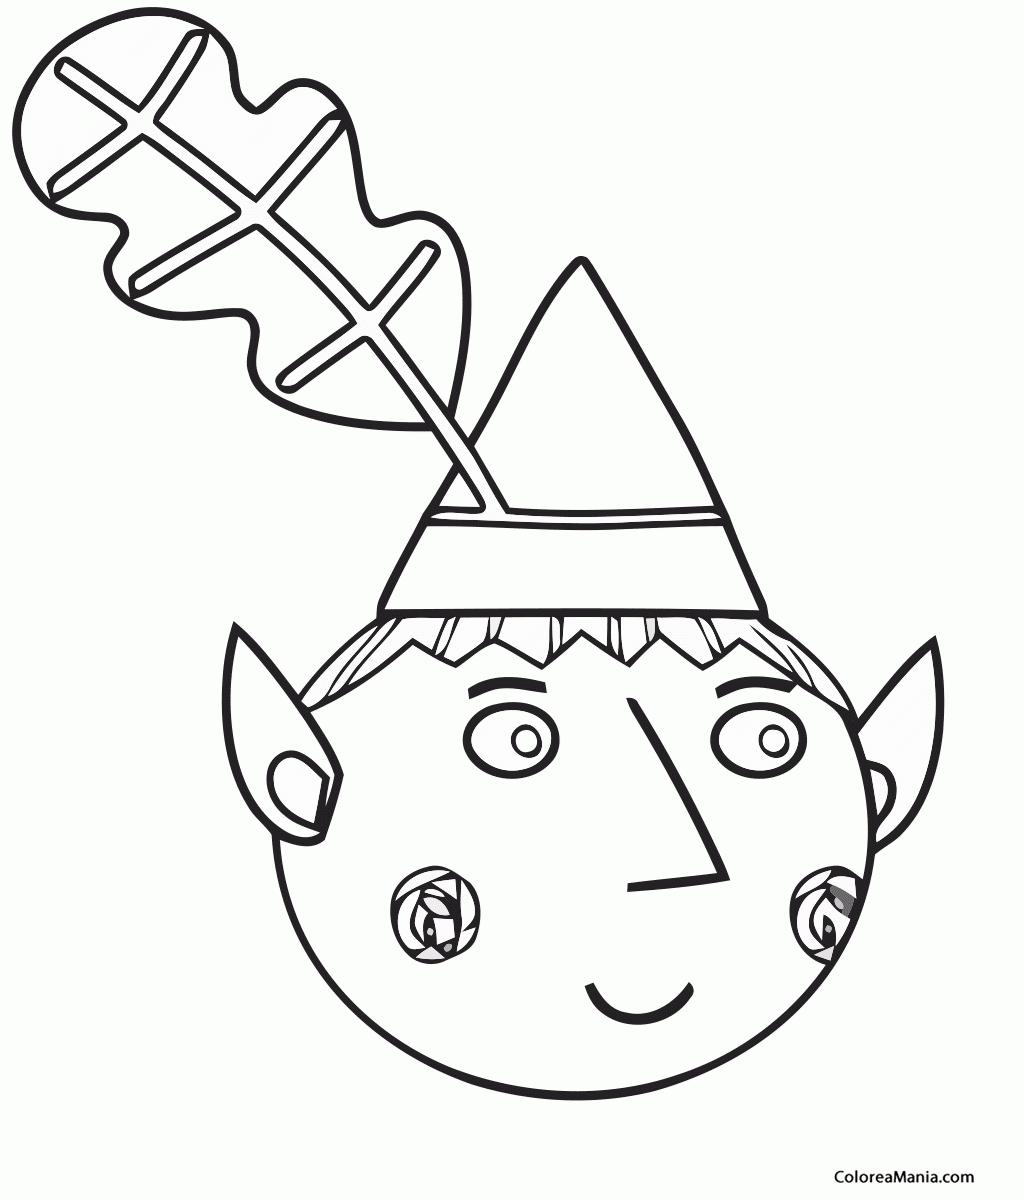 Colorear Ben cabeza (Ben y Holly), dibujo para colorear gratis